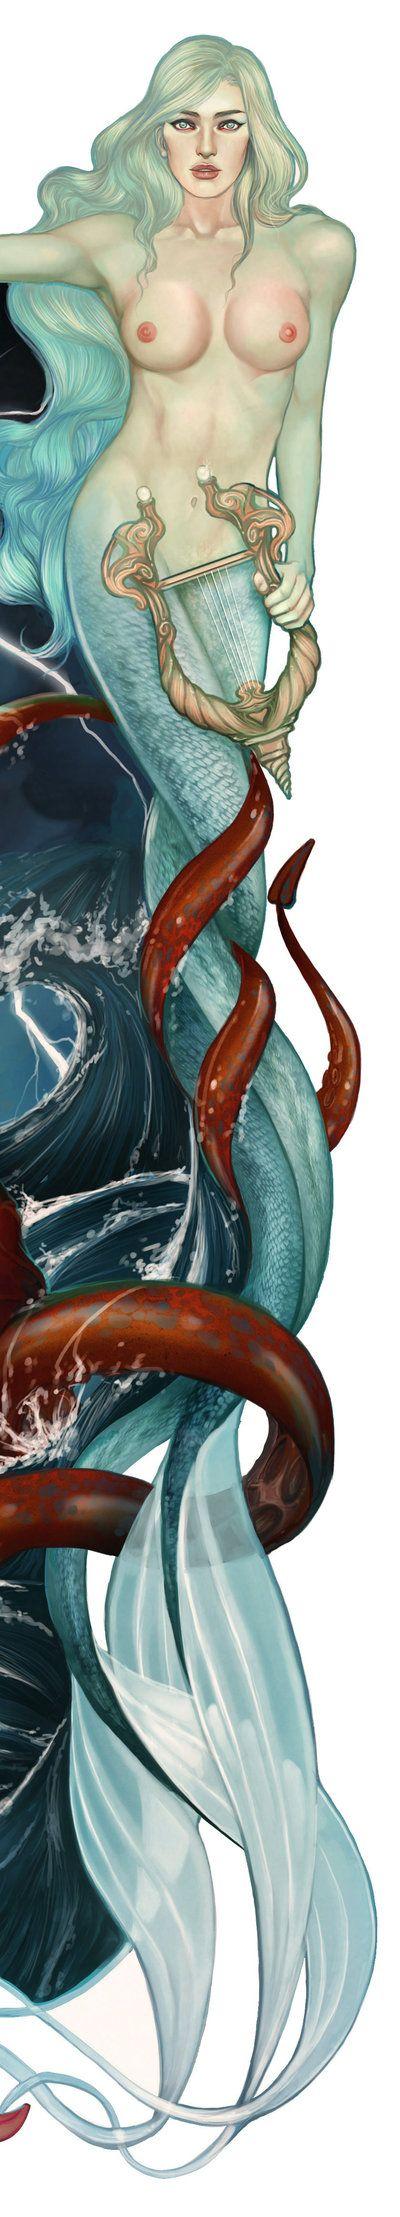 mermaid by JonathanChanutomo.deviantart